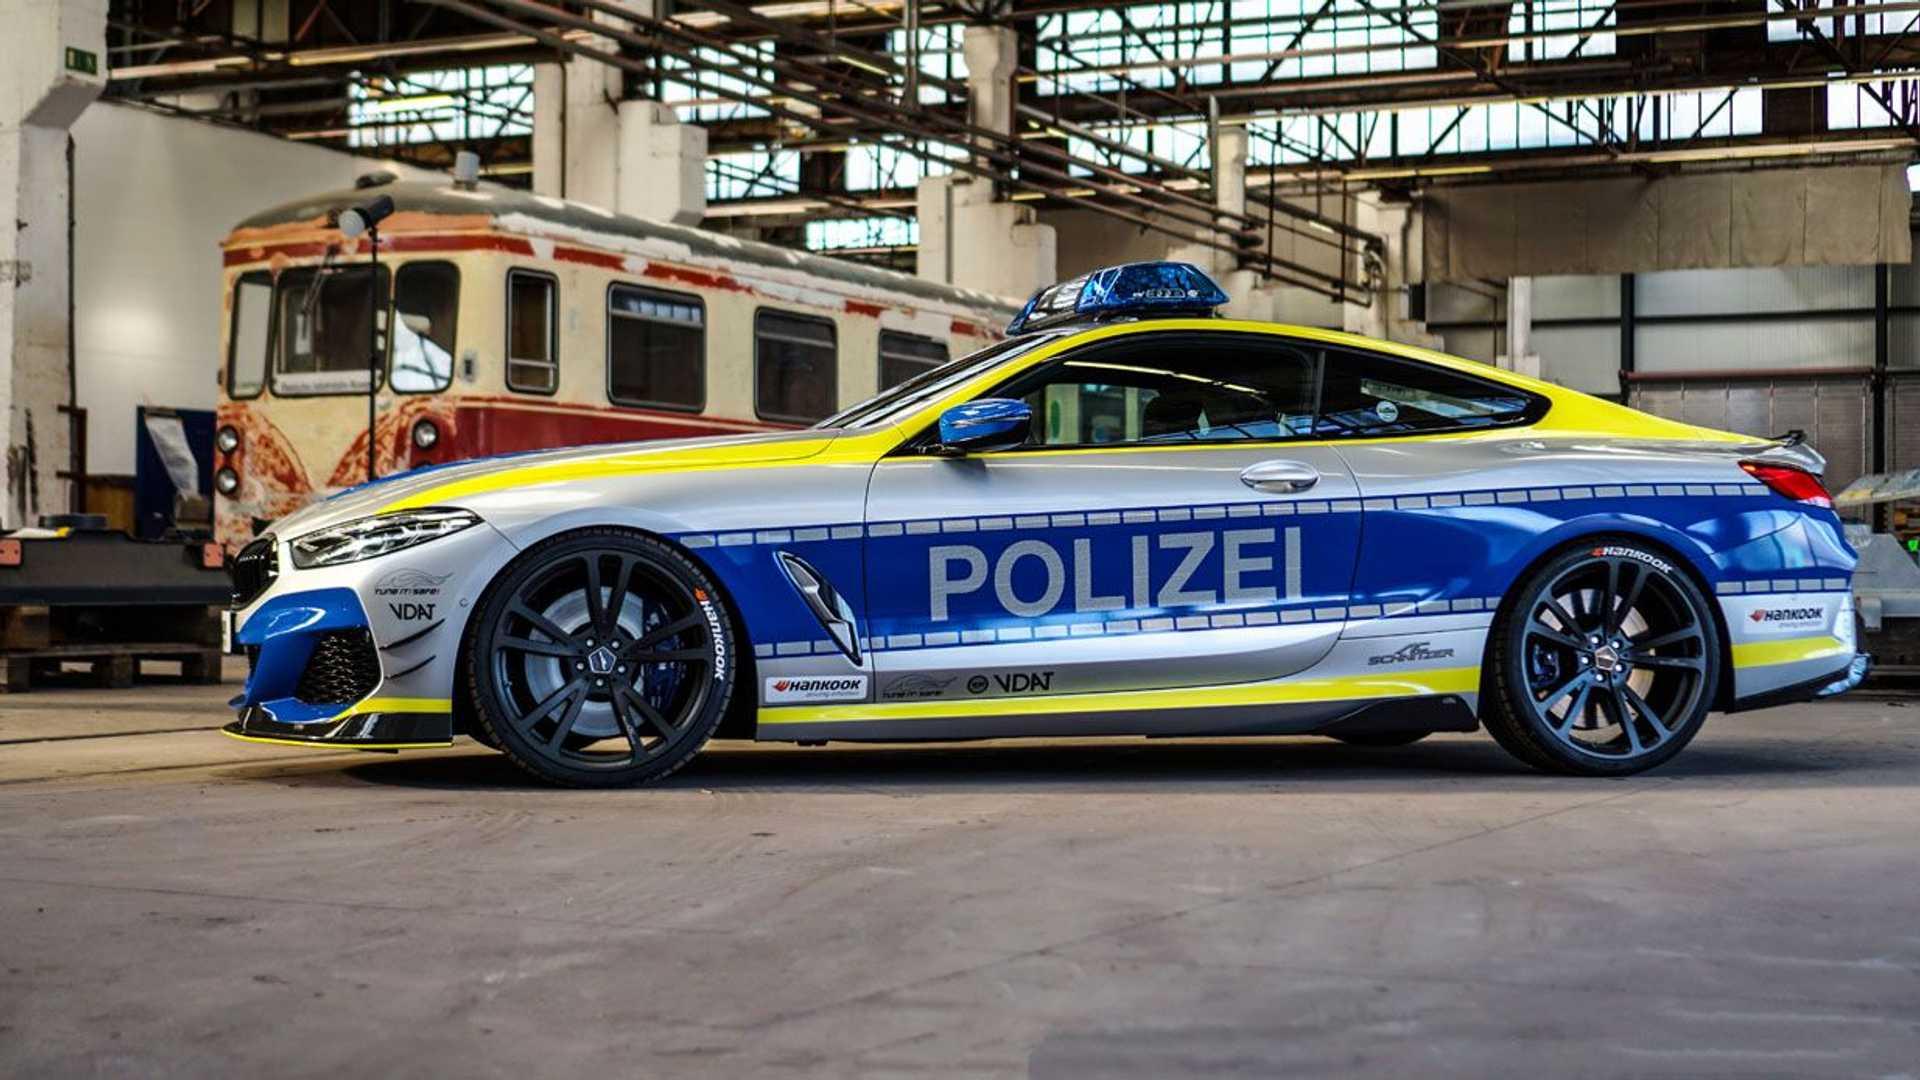 BMW-M850i-police-car-tune-it-safe-22